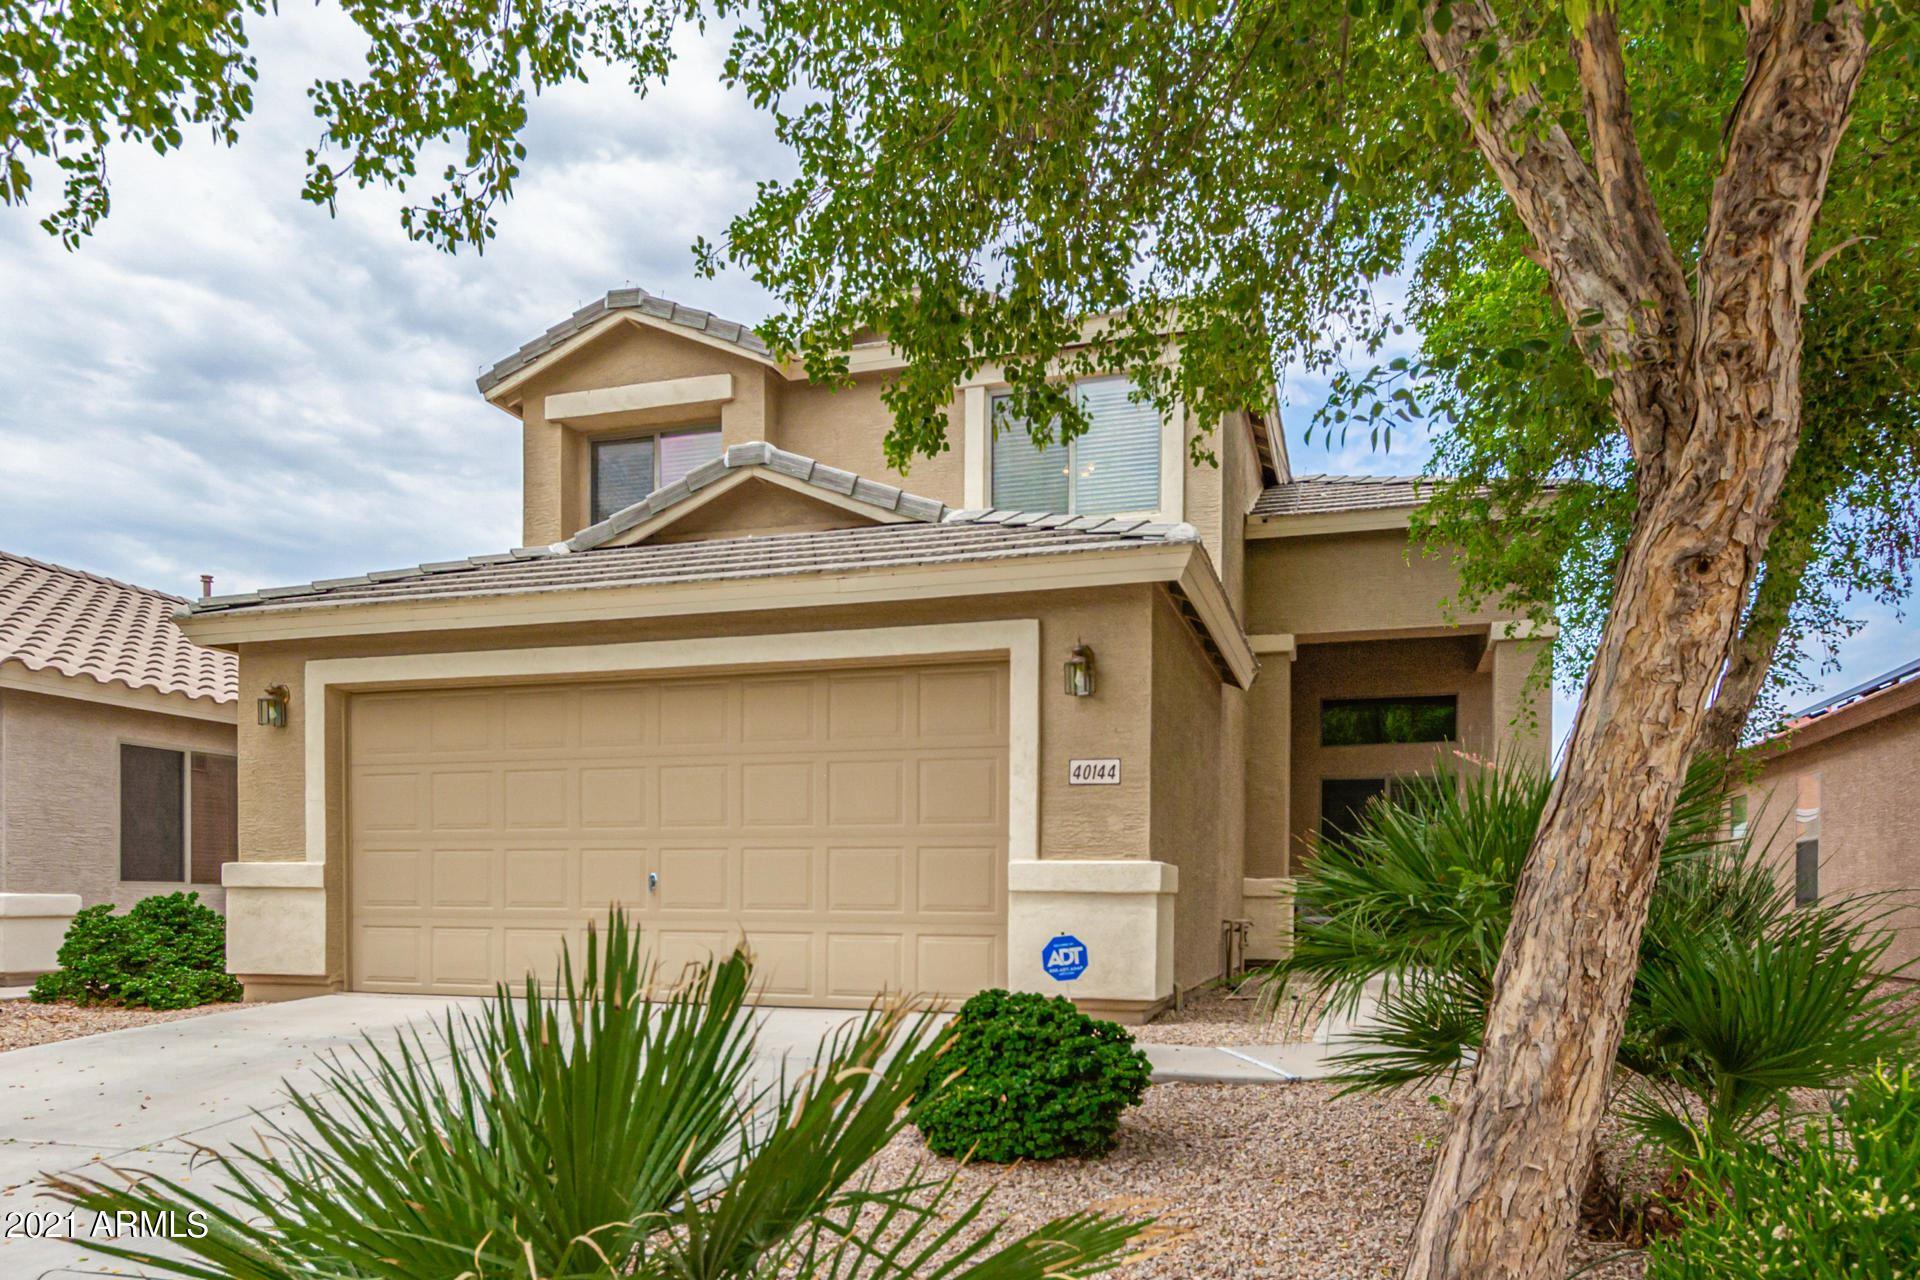 40144 W SANDERS Way, Maricopa, AZ 85138 - MLS#: 6268808